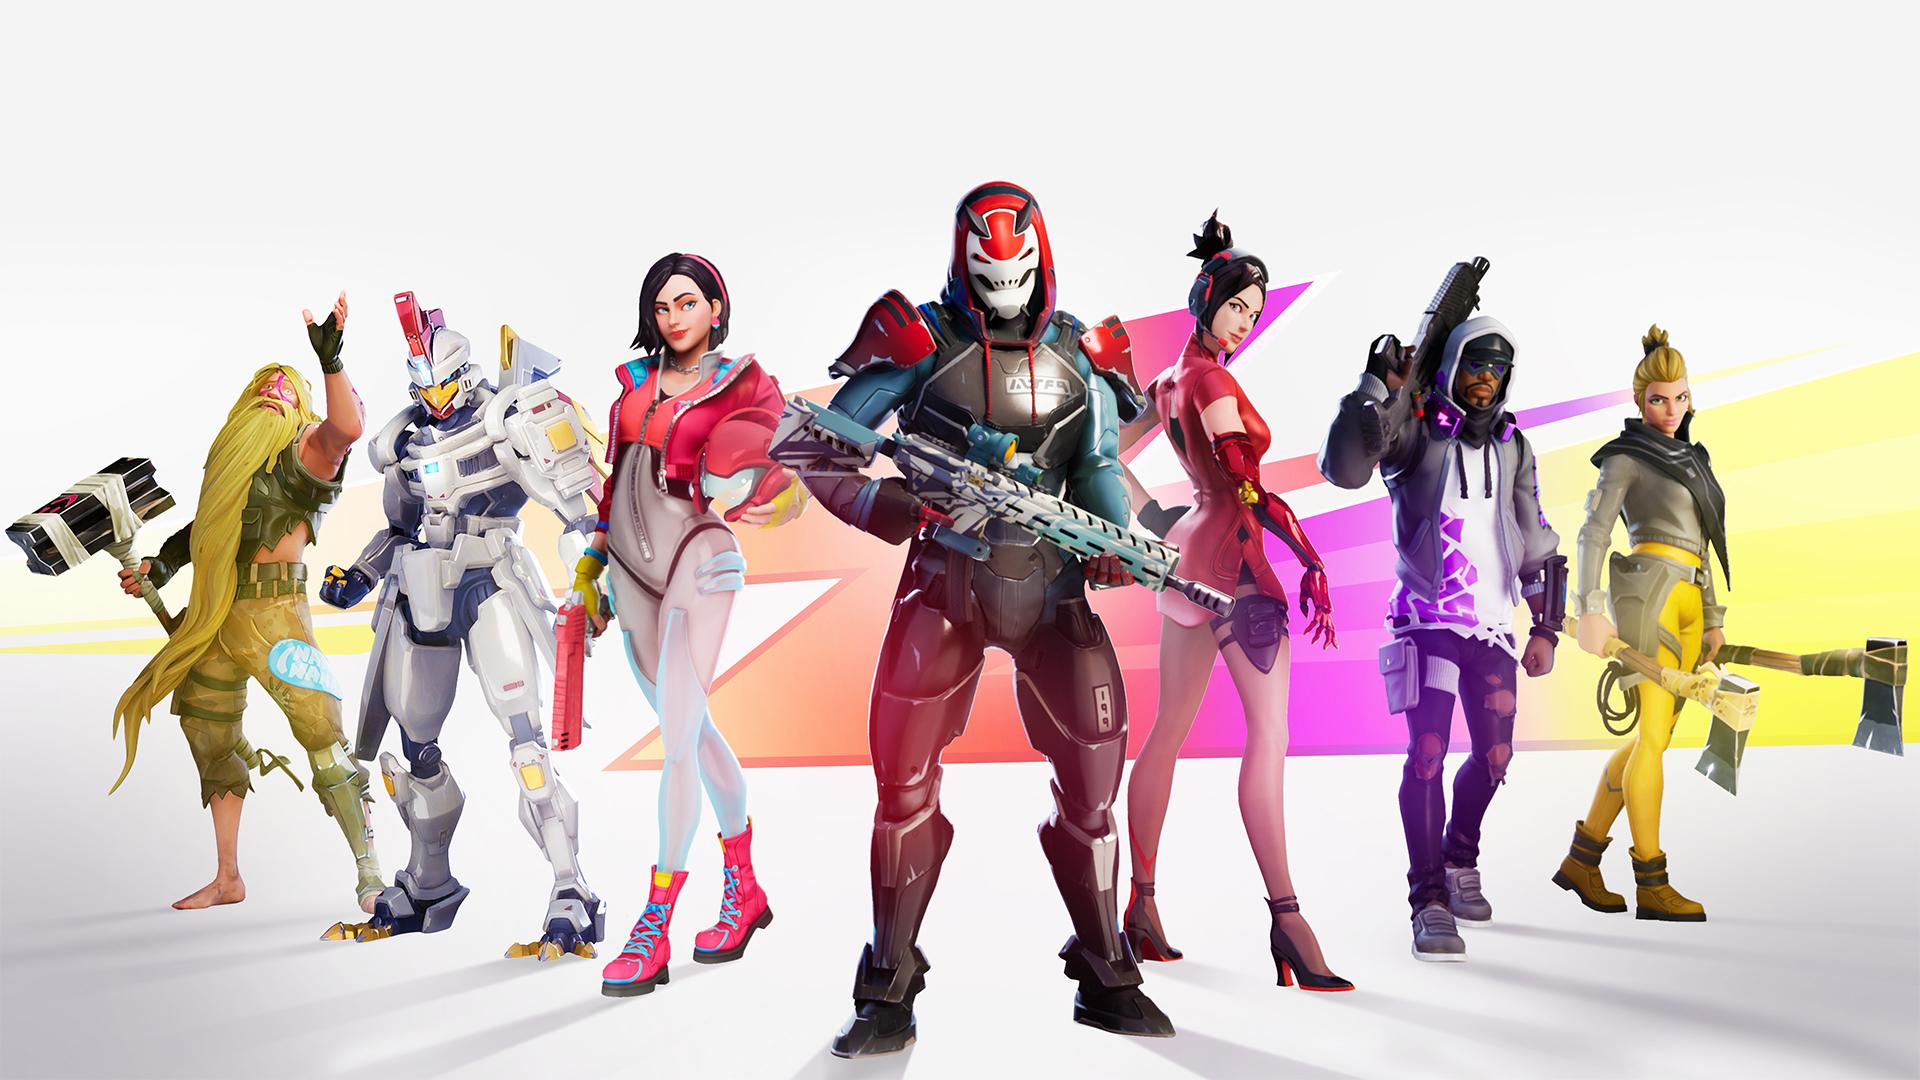 Fortnite 2019 Wallpaper Hd Games 4k Wallpapers Images